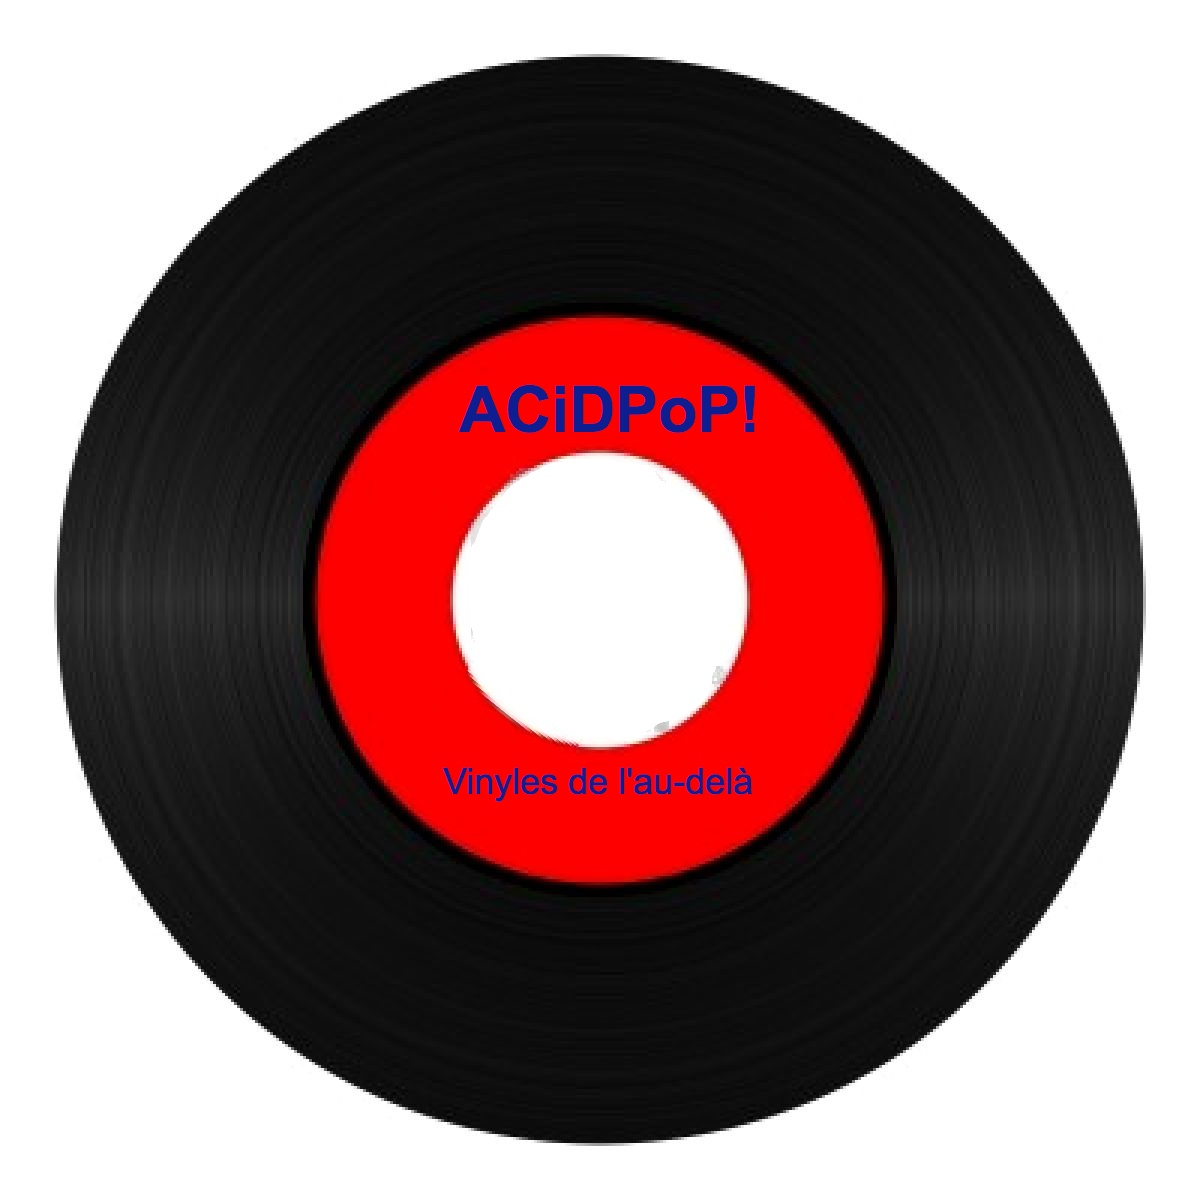 http://2.bp.blogspot.com/-FFV-xjHeY3c/TZydkUqaUwI/AAAAAAAAVZM/1vDhX1NyXIk/s1600/vinyle.jpeg